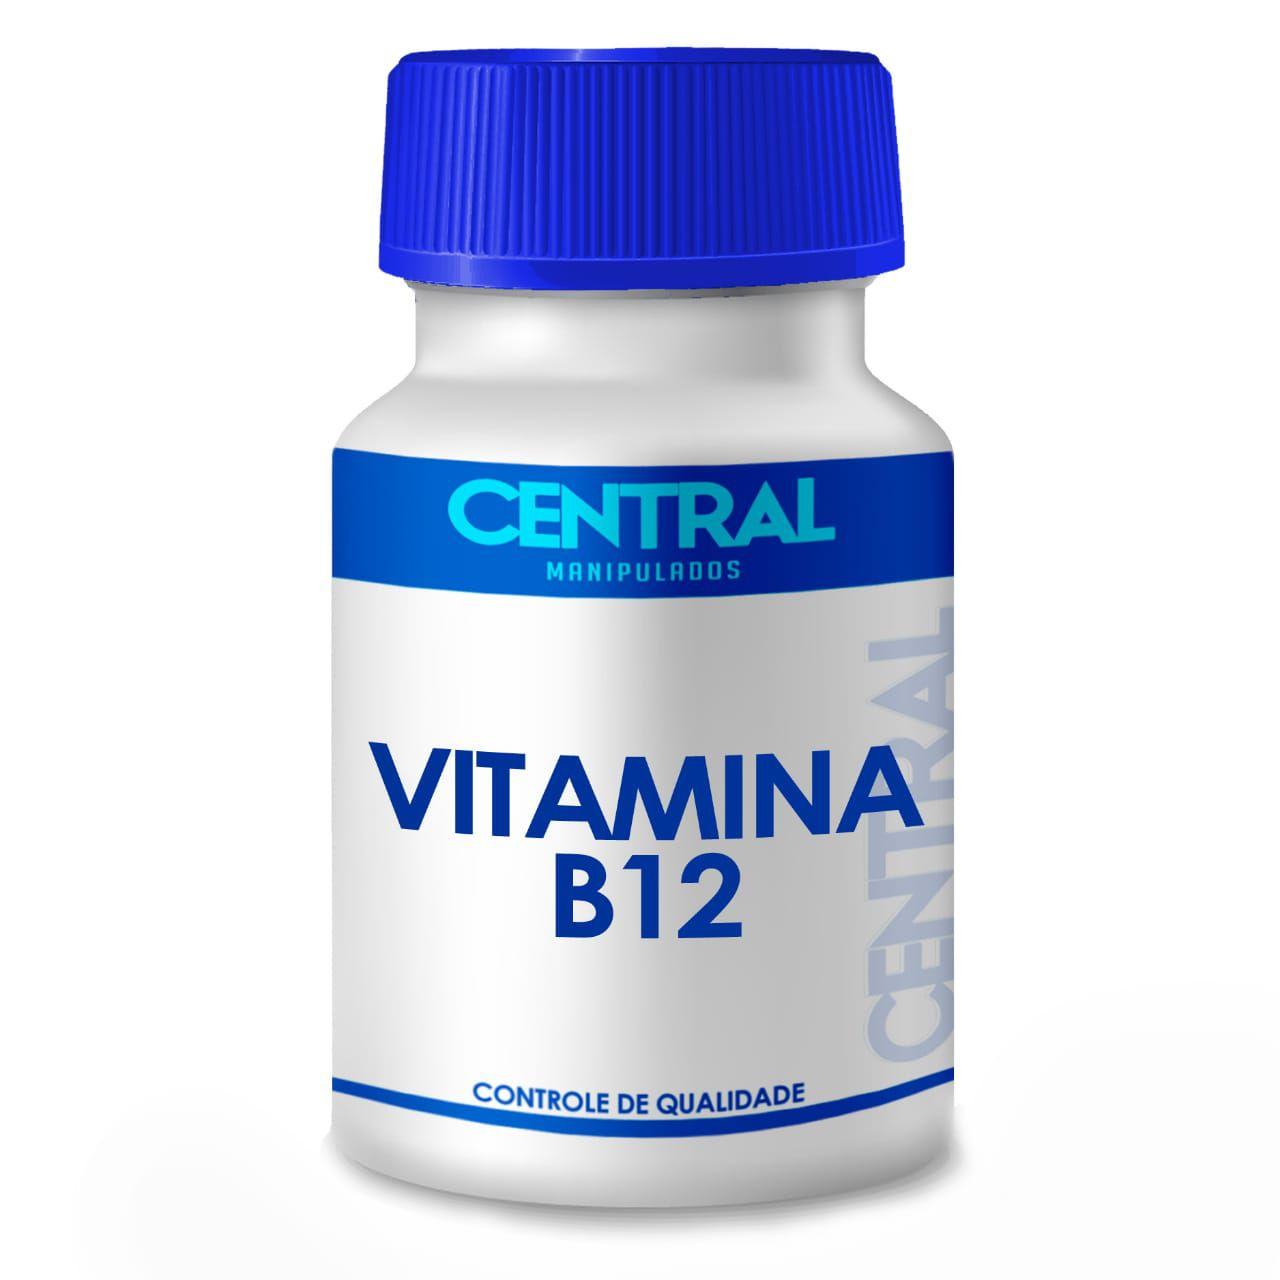 Vitamina B12 - Tratamento de anemia e fortalece o  sistema imunológico - 1mg 30 Comprimidos Sublingual